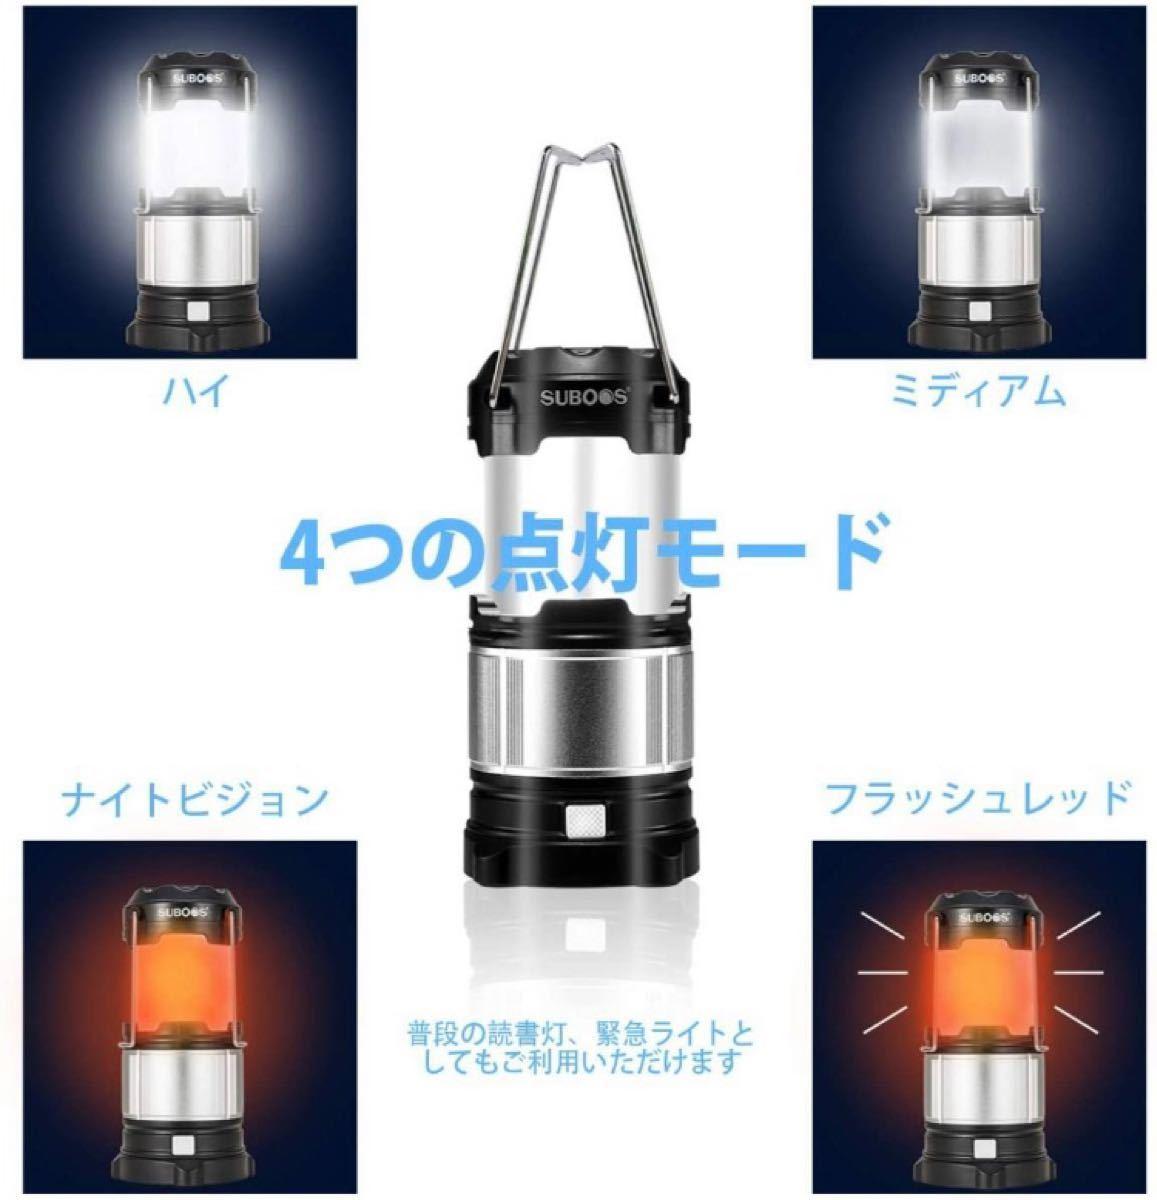 LEDランタン USB充電式 防水IPX5 アウトドア キャンプ キャンプランタン 懐中電灯